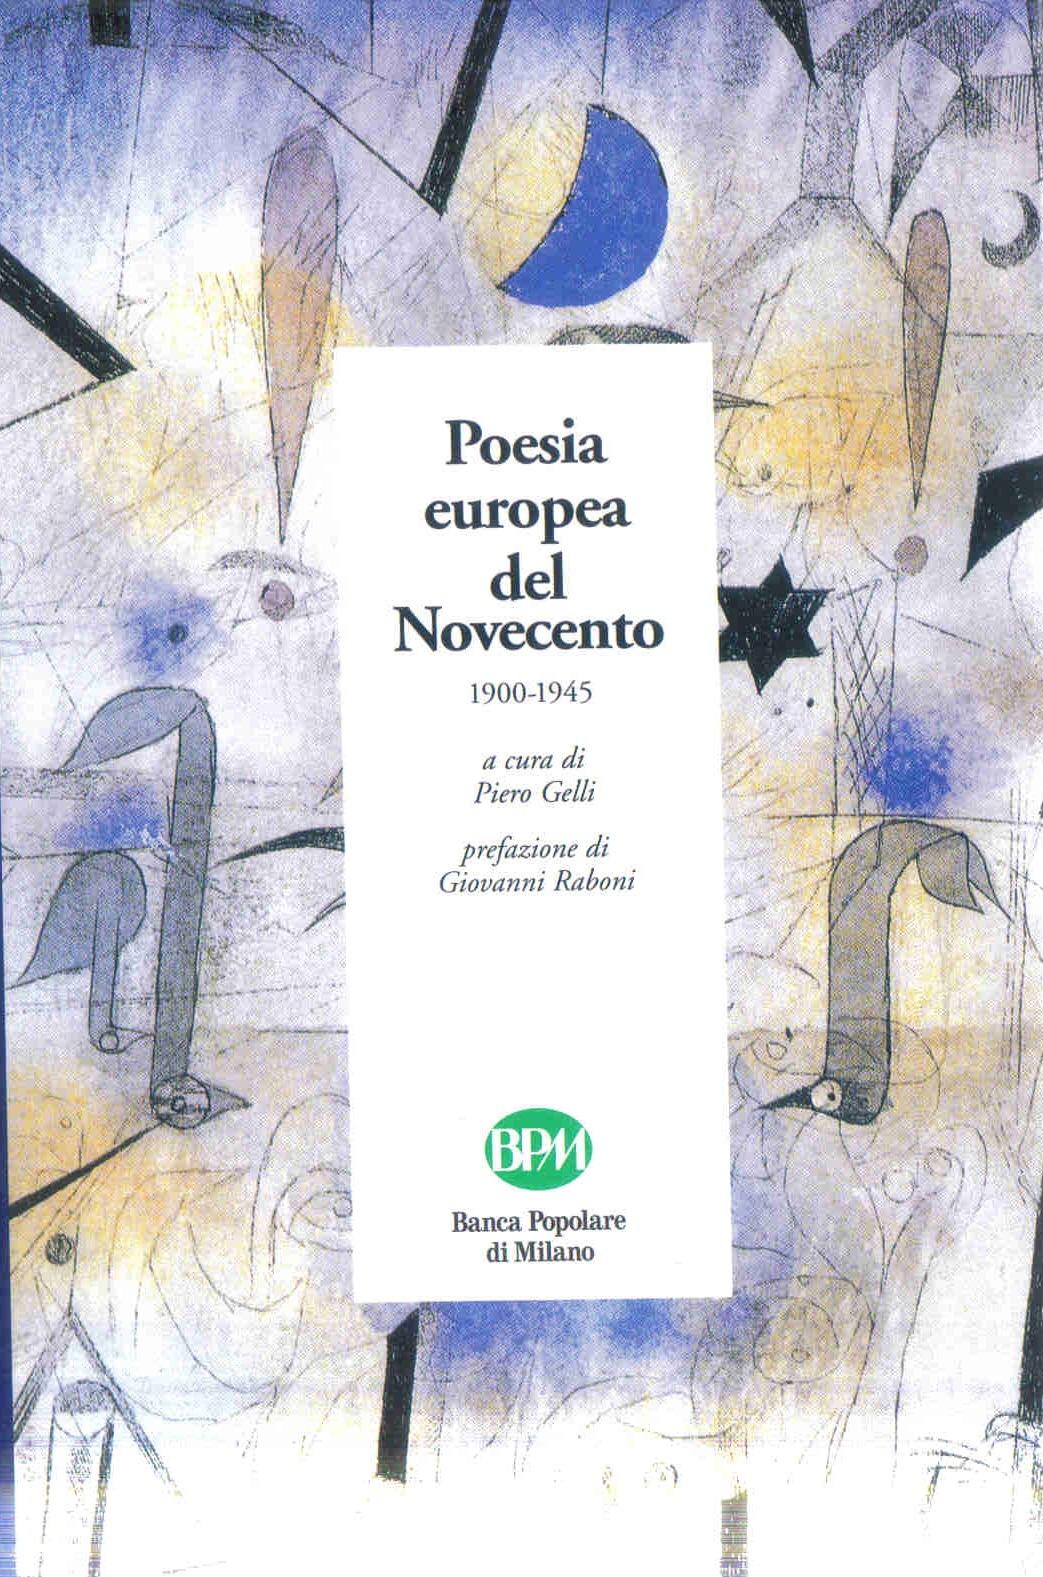 Poesia europea del Novecento